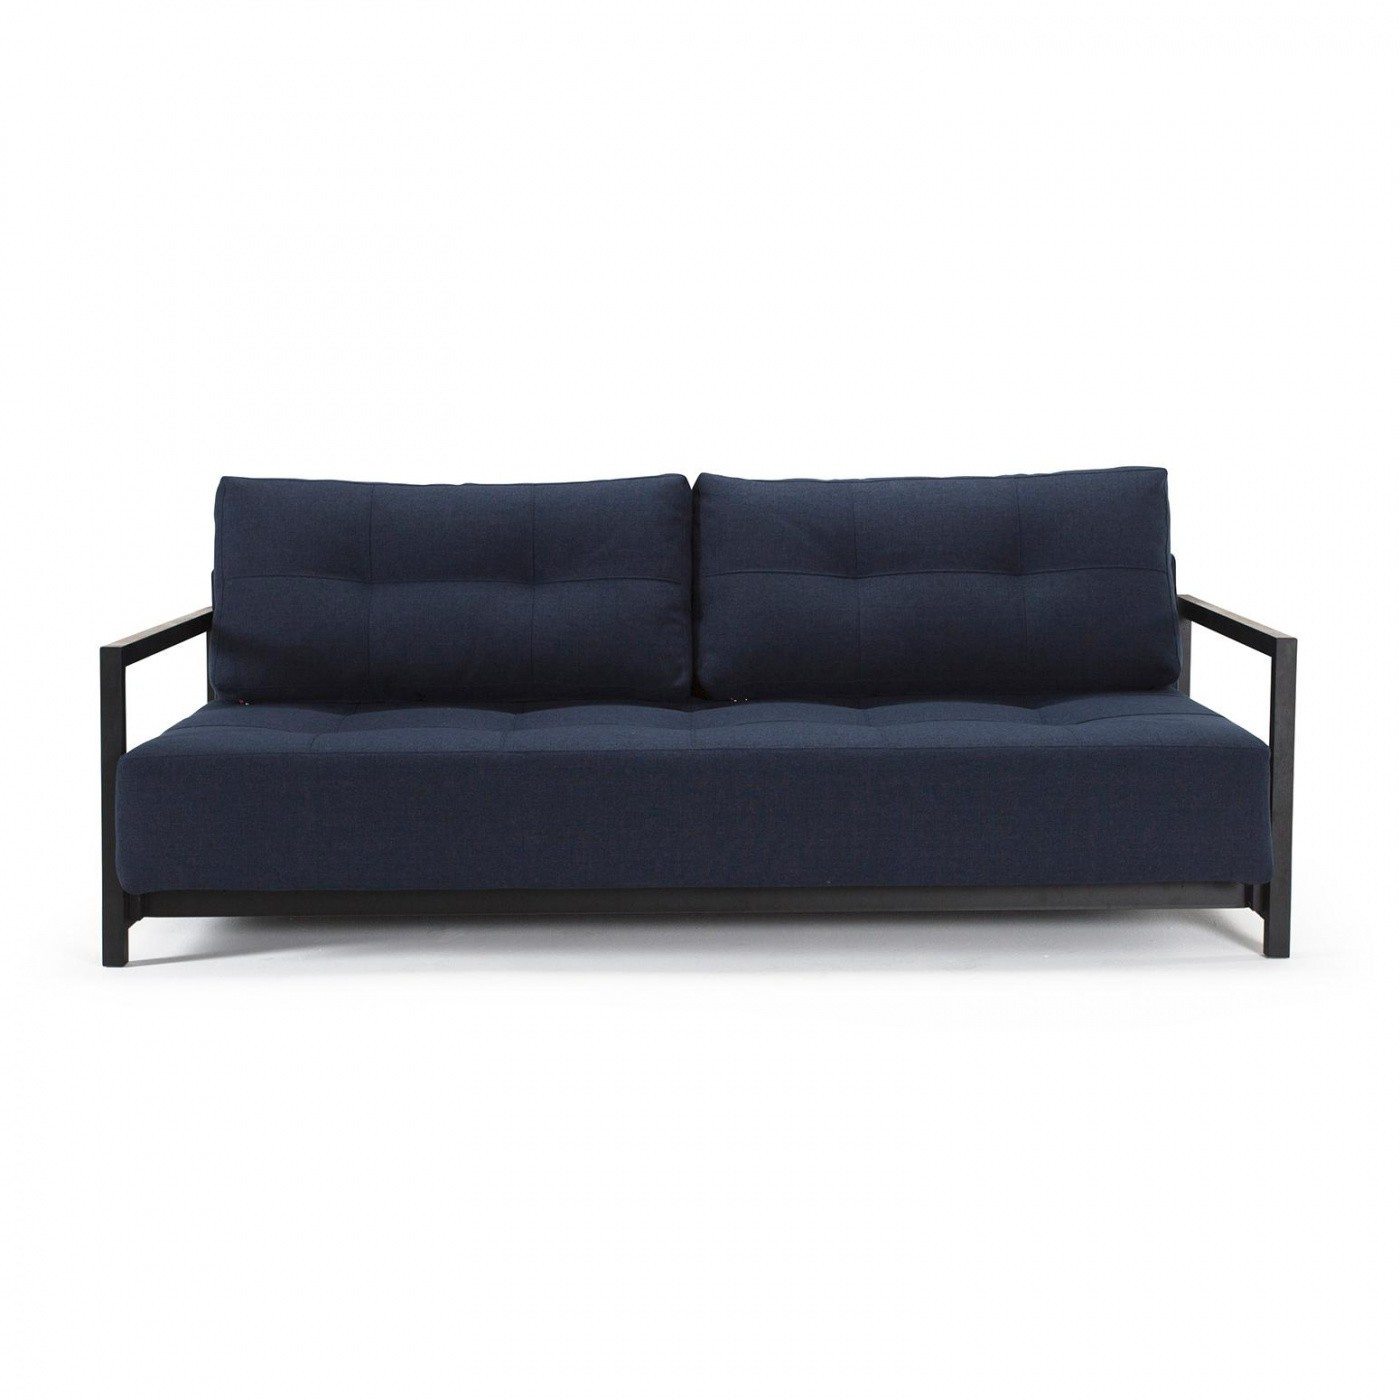 Fantastisk Innovation Bifrost Deluxe Sofa Bed | AmbienteDirect IJ36